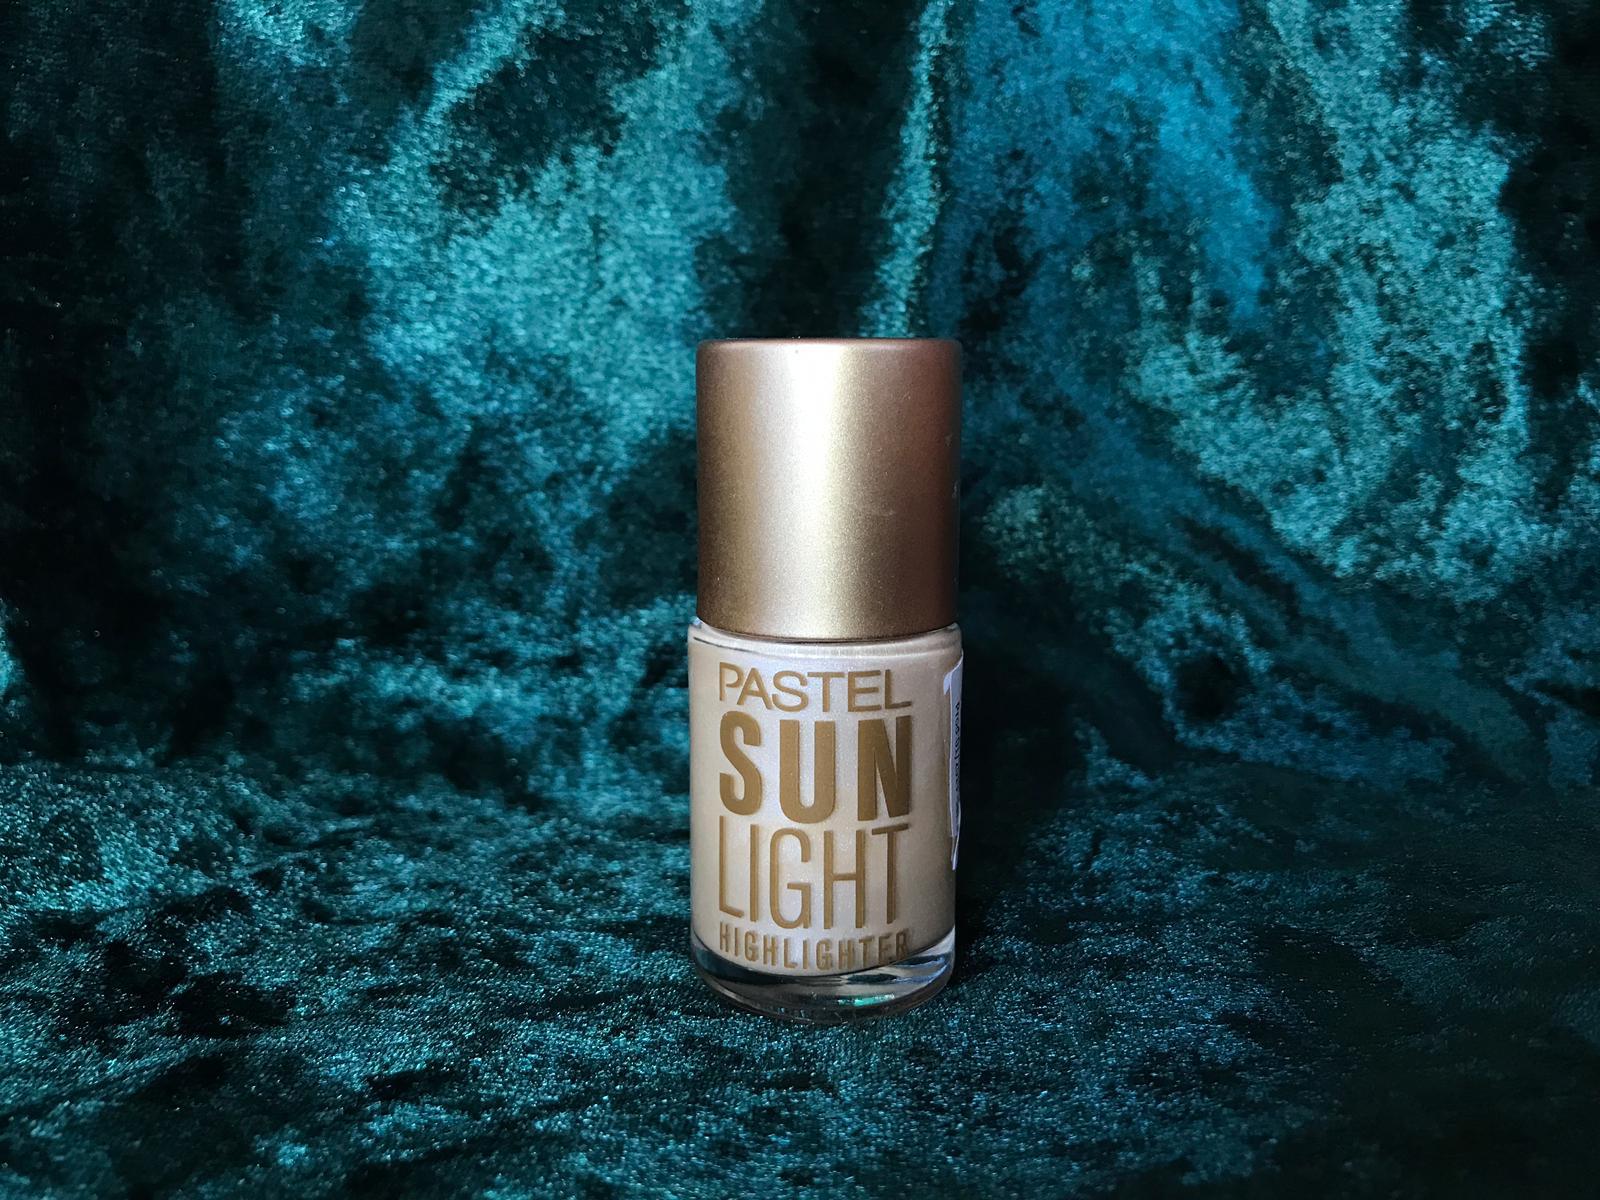 PASTEL SUNLIGHT HIGHLIGHTER YORUMU